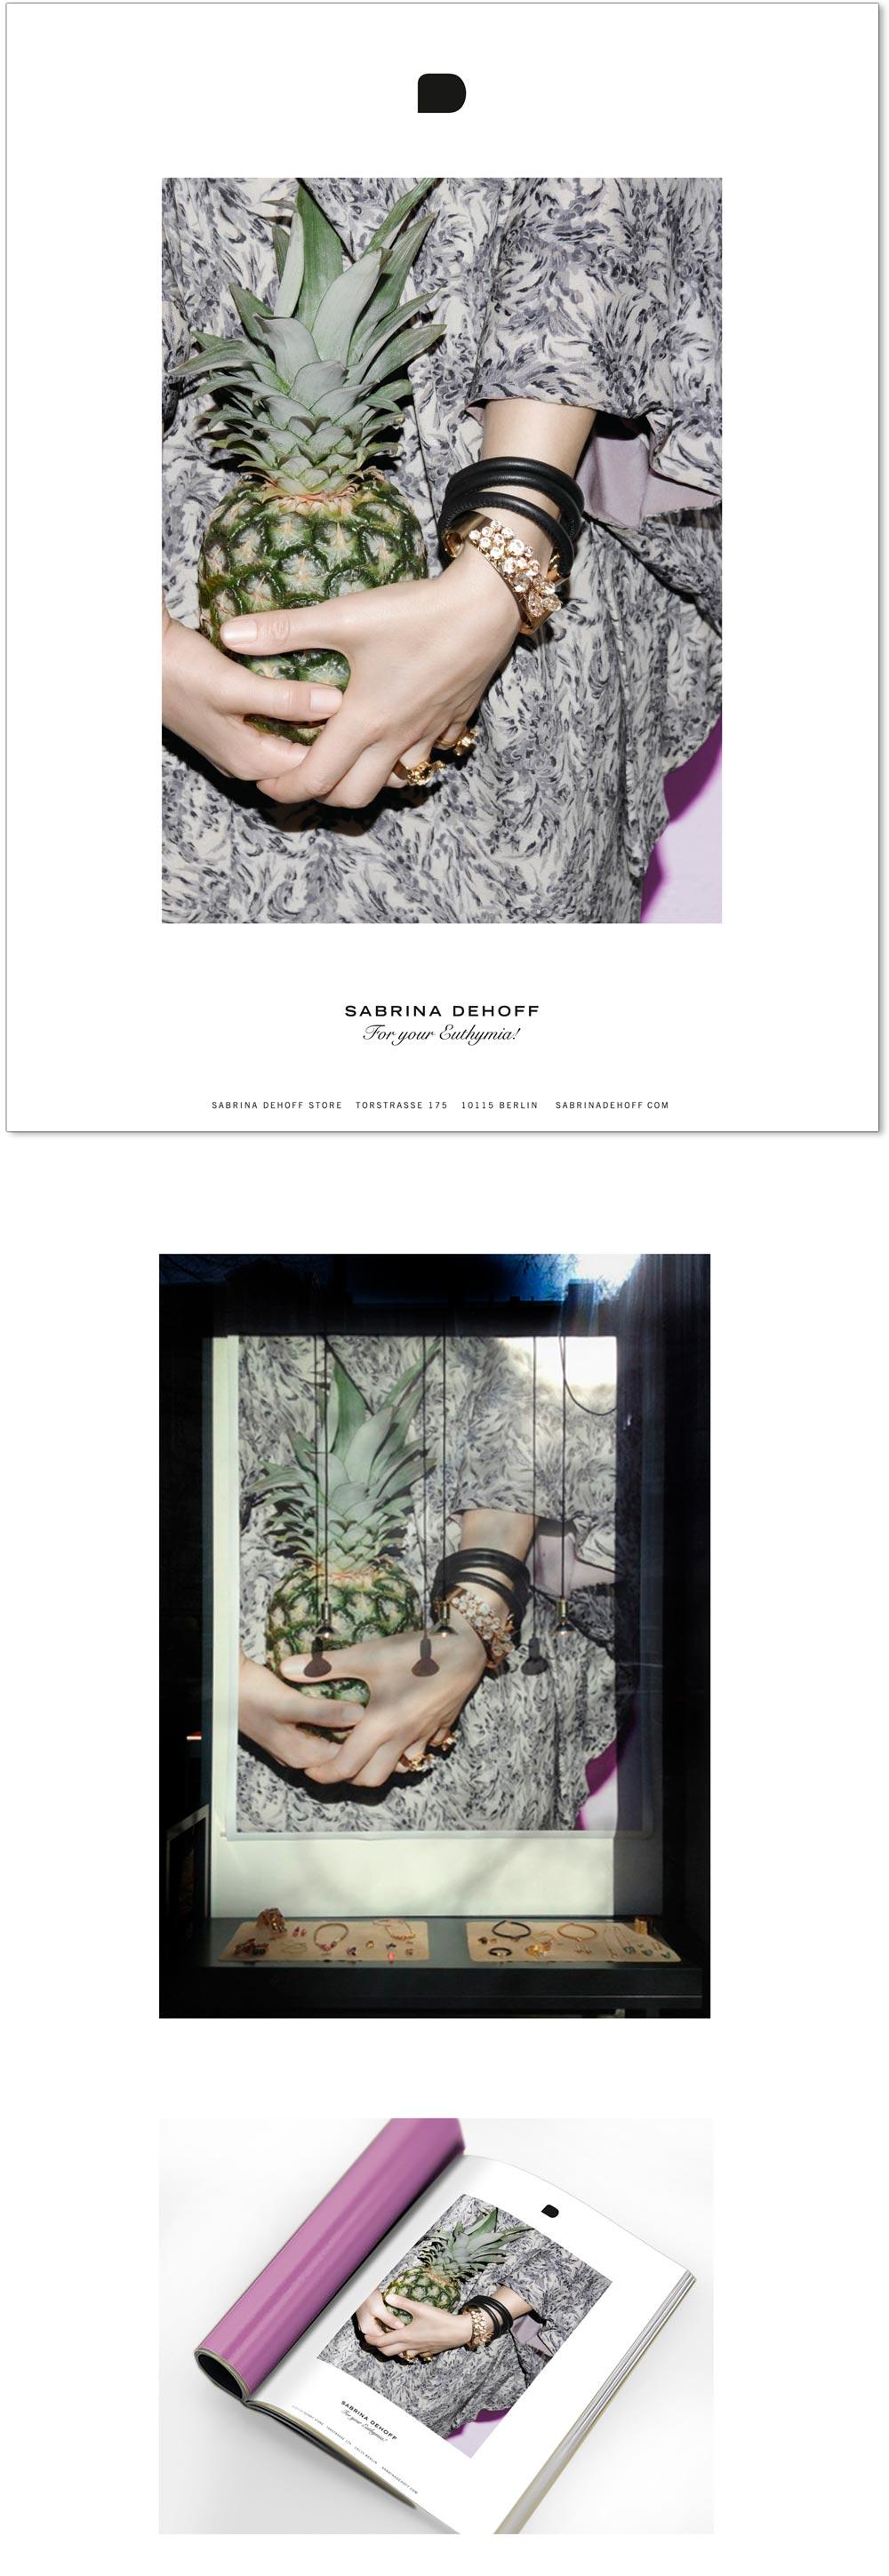 COEN Concept & Design Berlin - Sabrina Dehoff